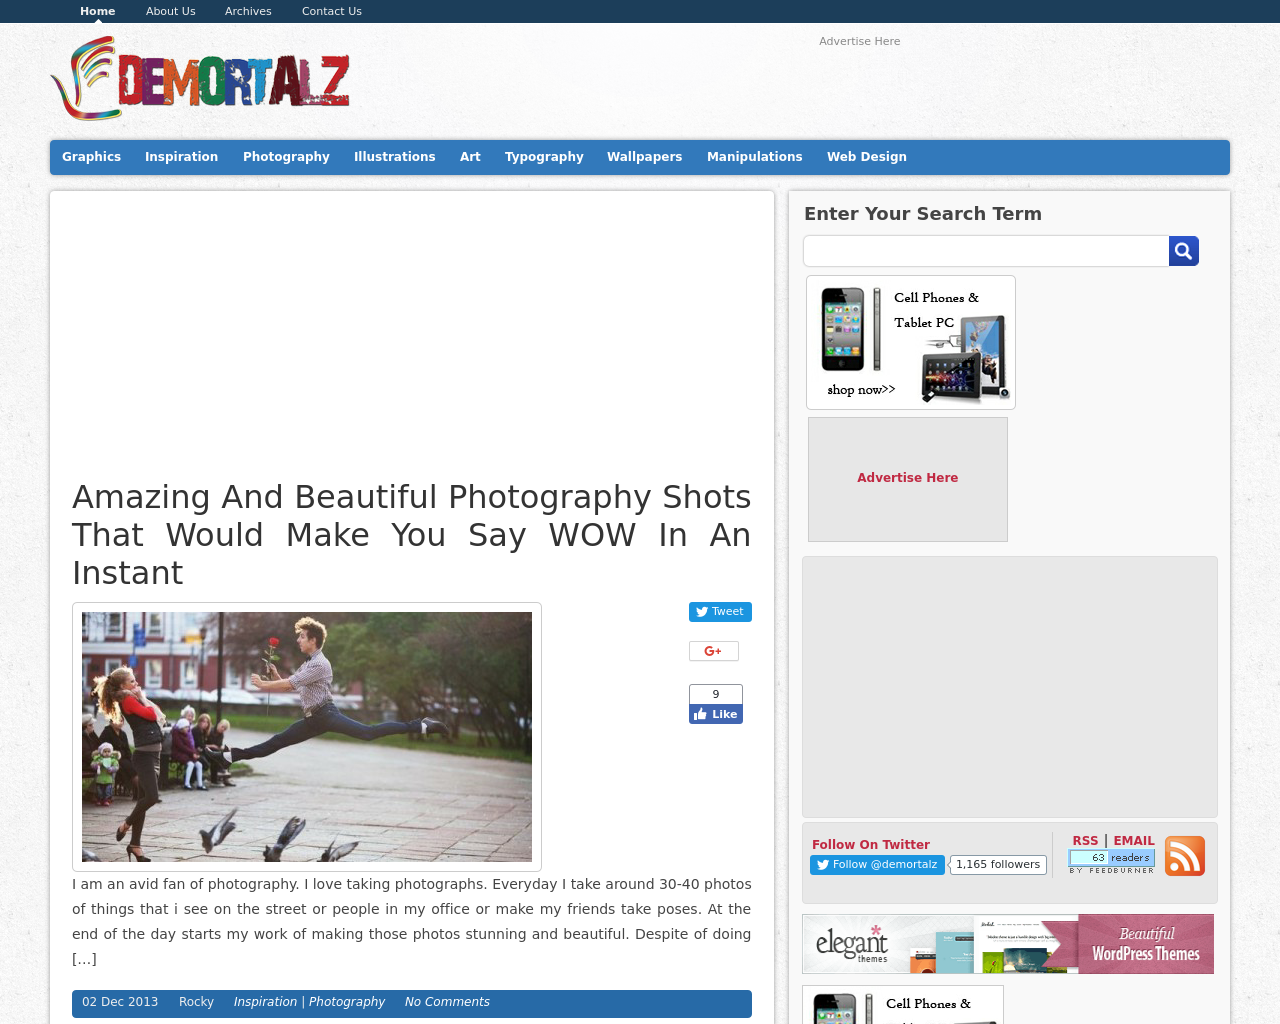 Demortalz-Advertising-Reviews-Pricing